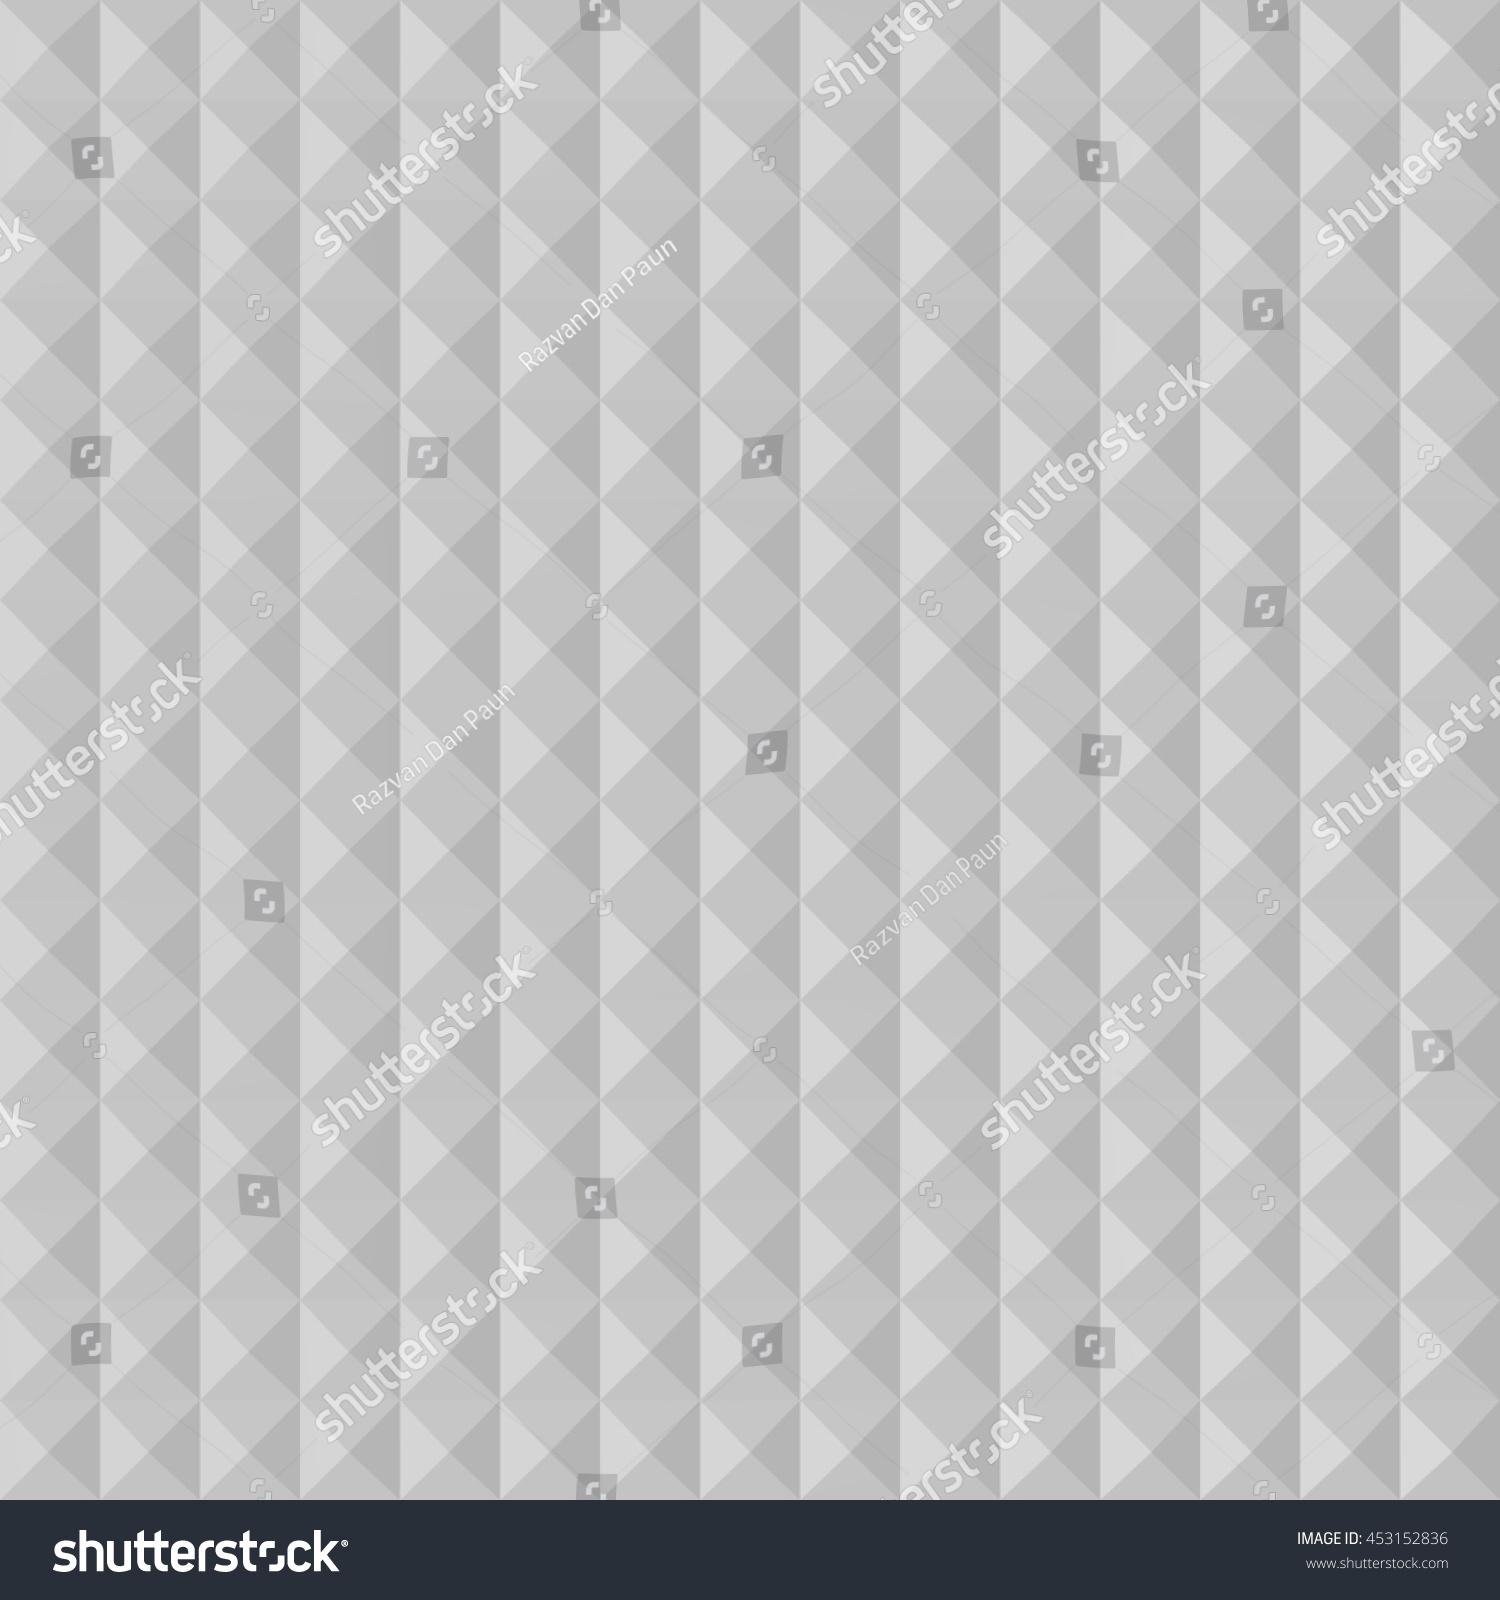 Flat Pyramid Pattern Seamless 3d Illustration Stock Illustration ...